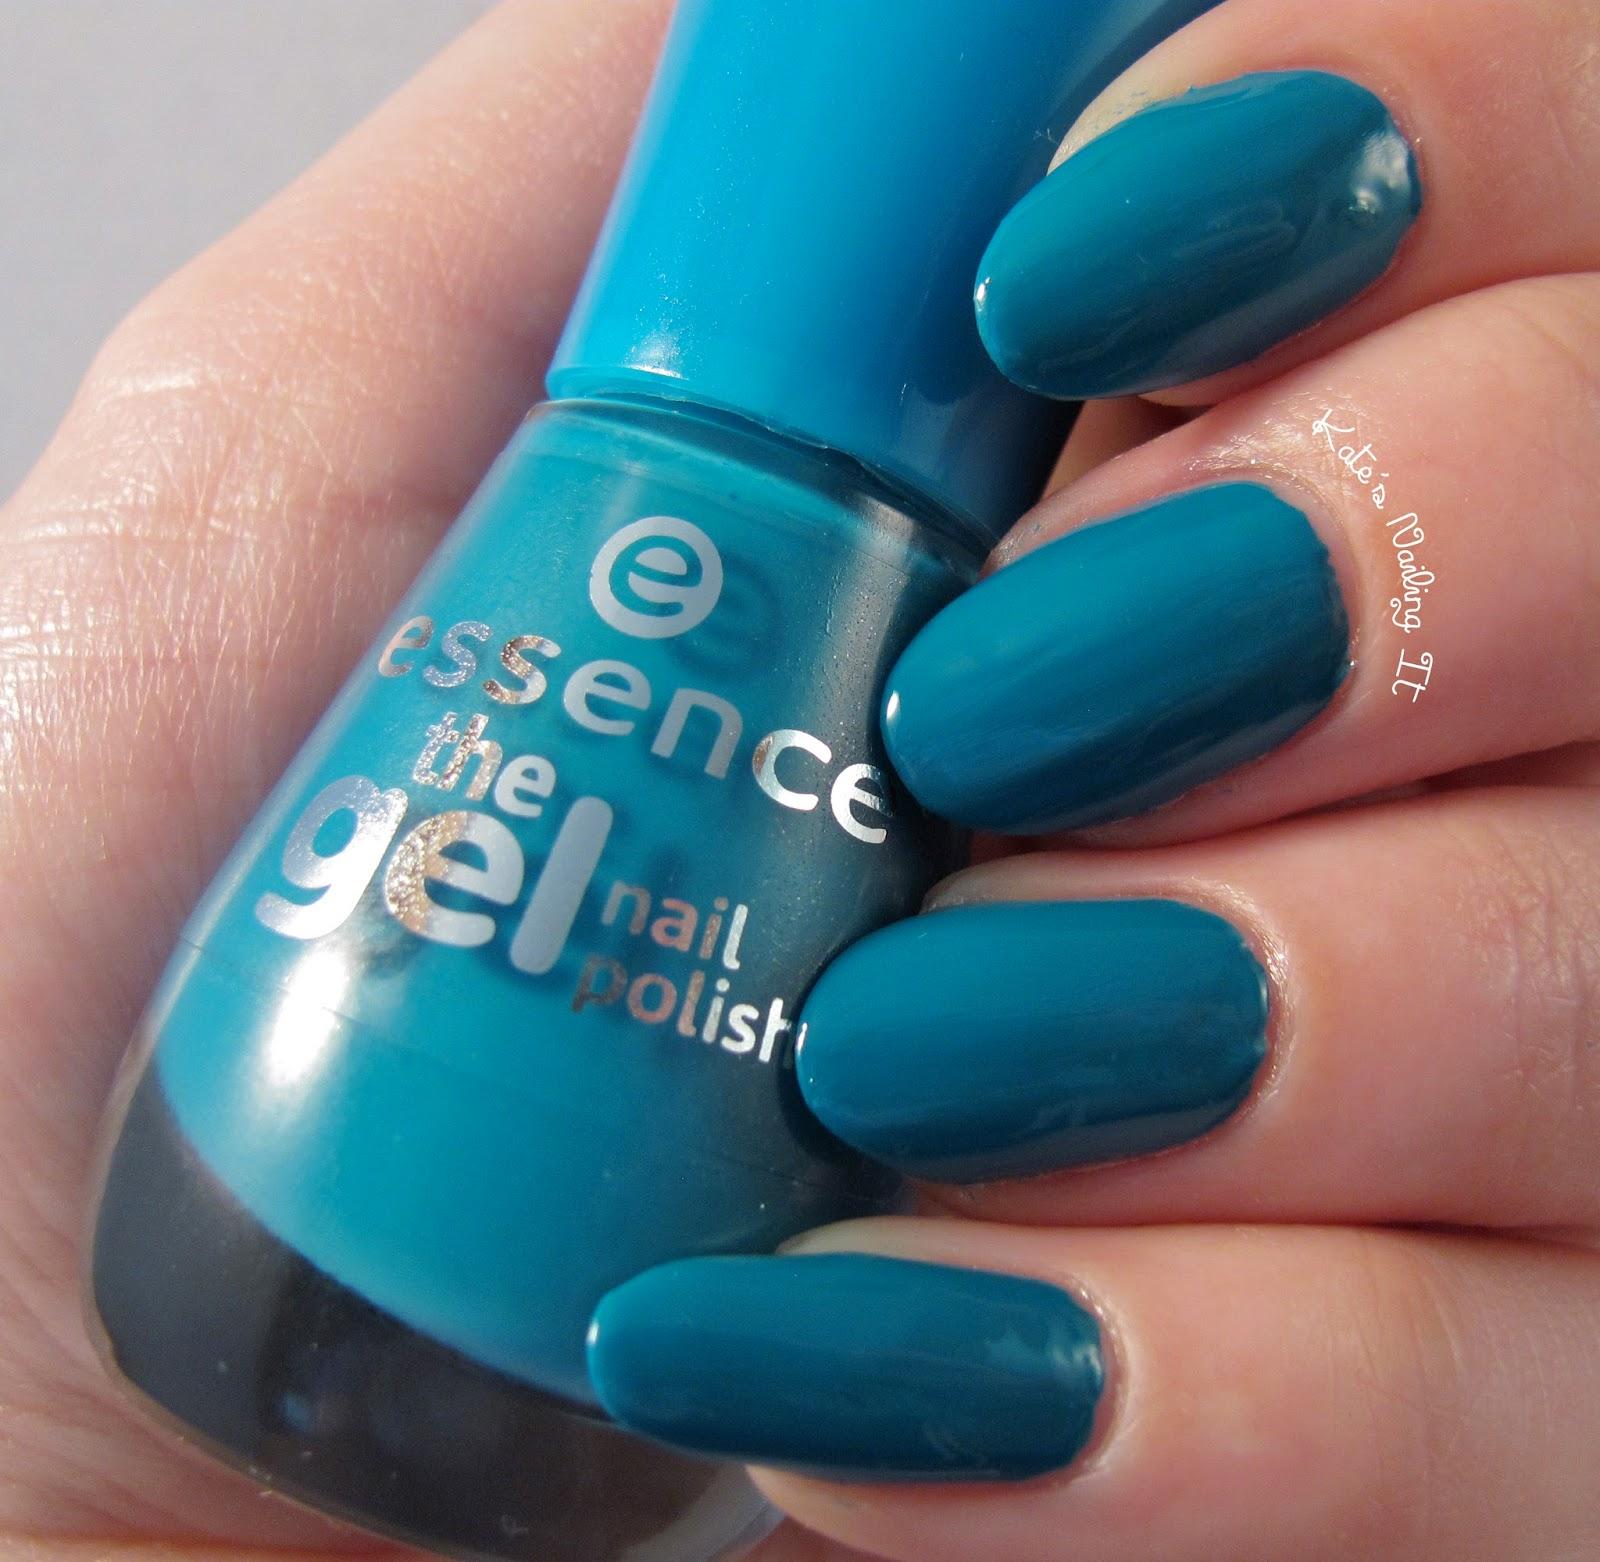 Kate\'s Nailing It: Essence: The Gel Nail Polish wear test